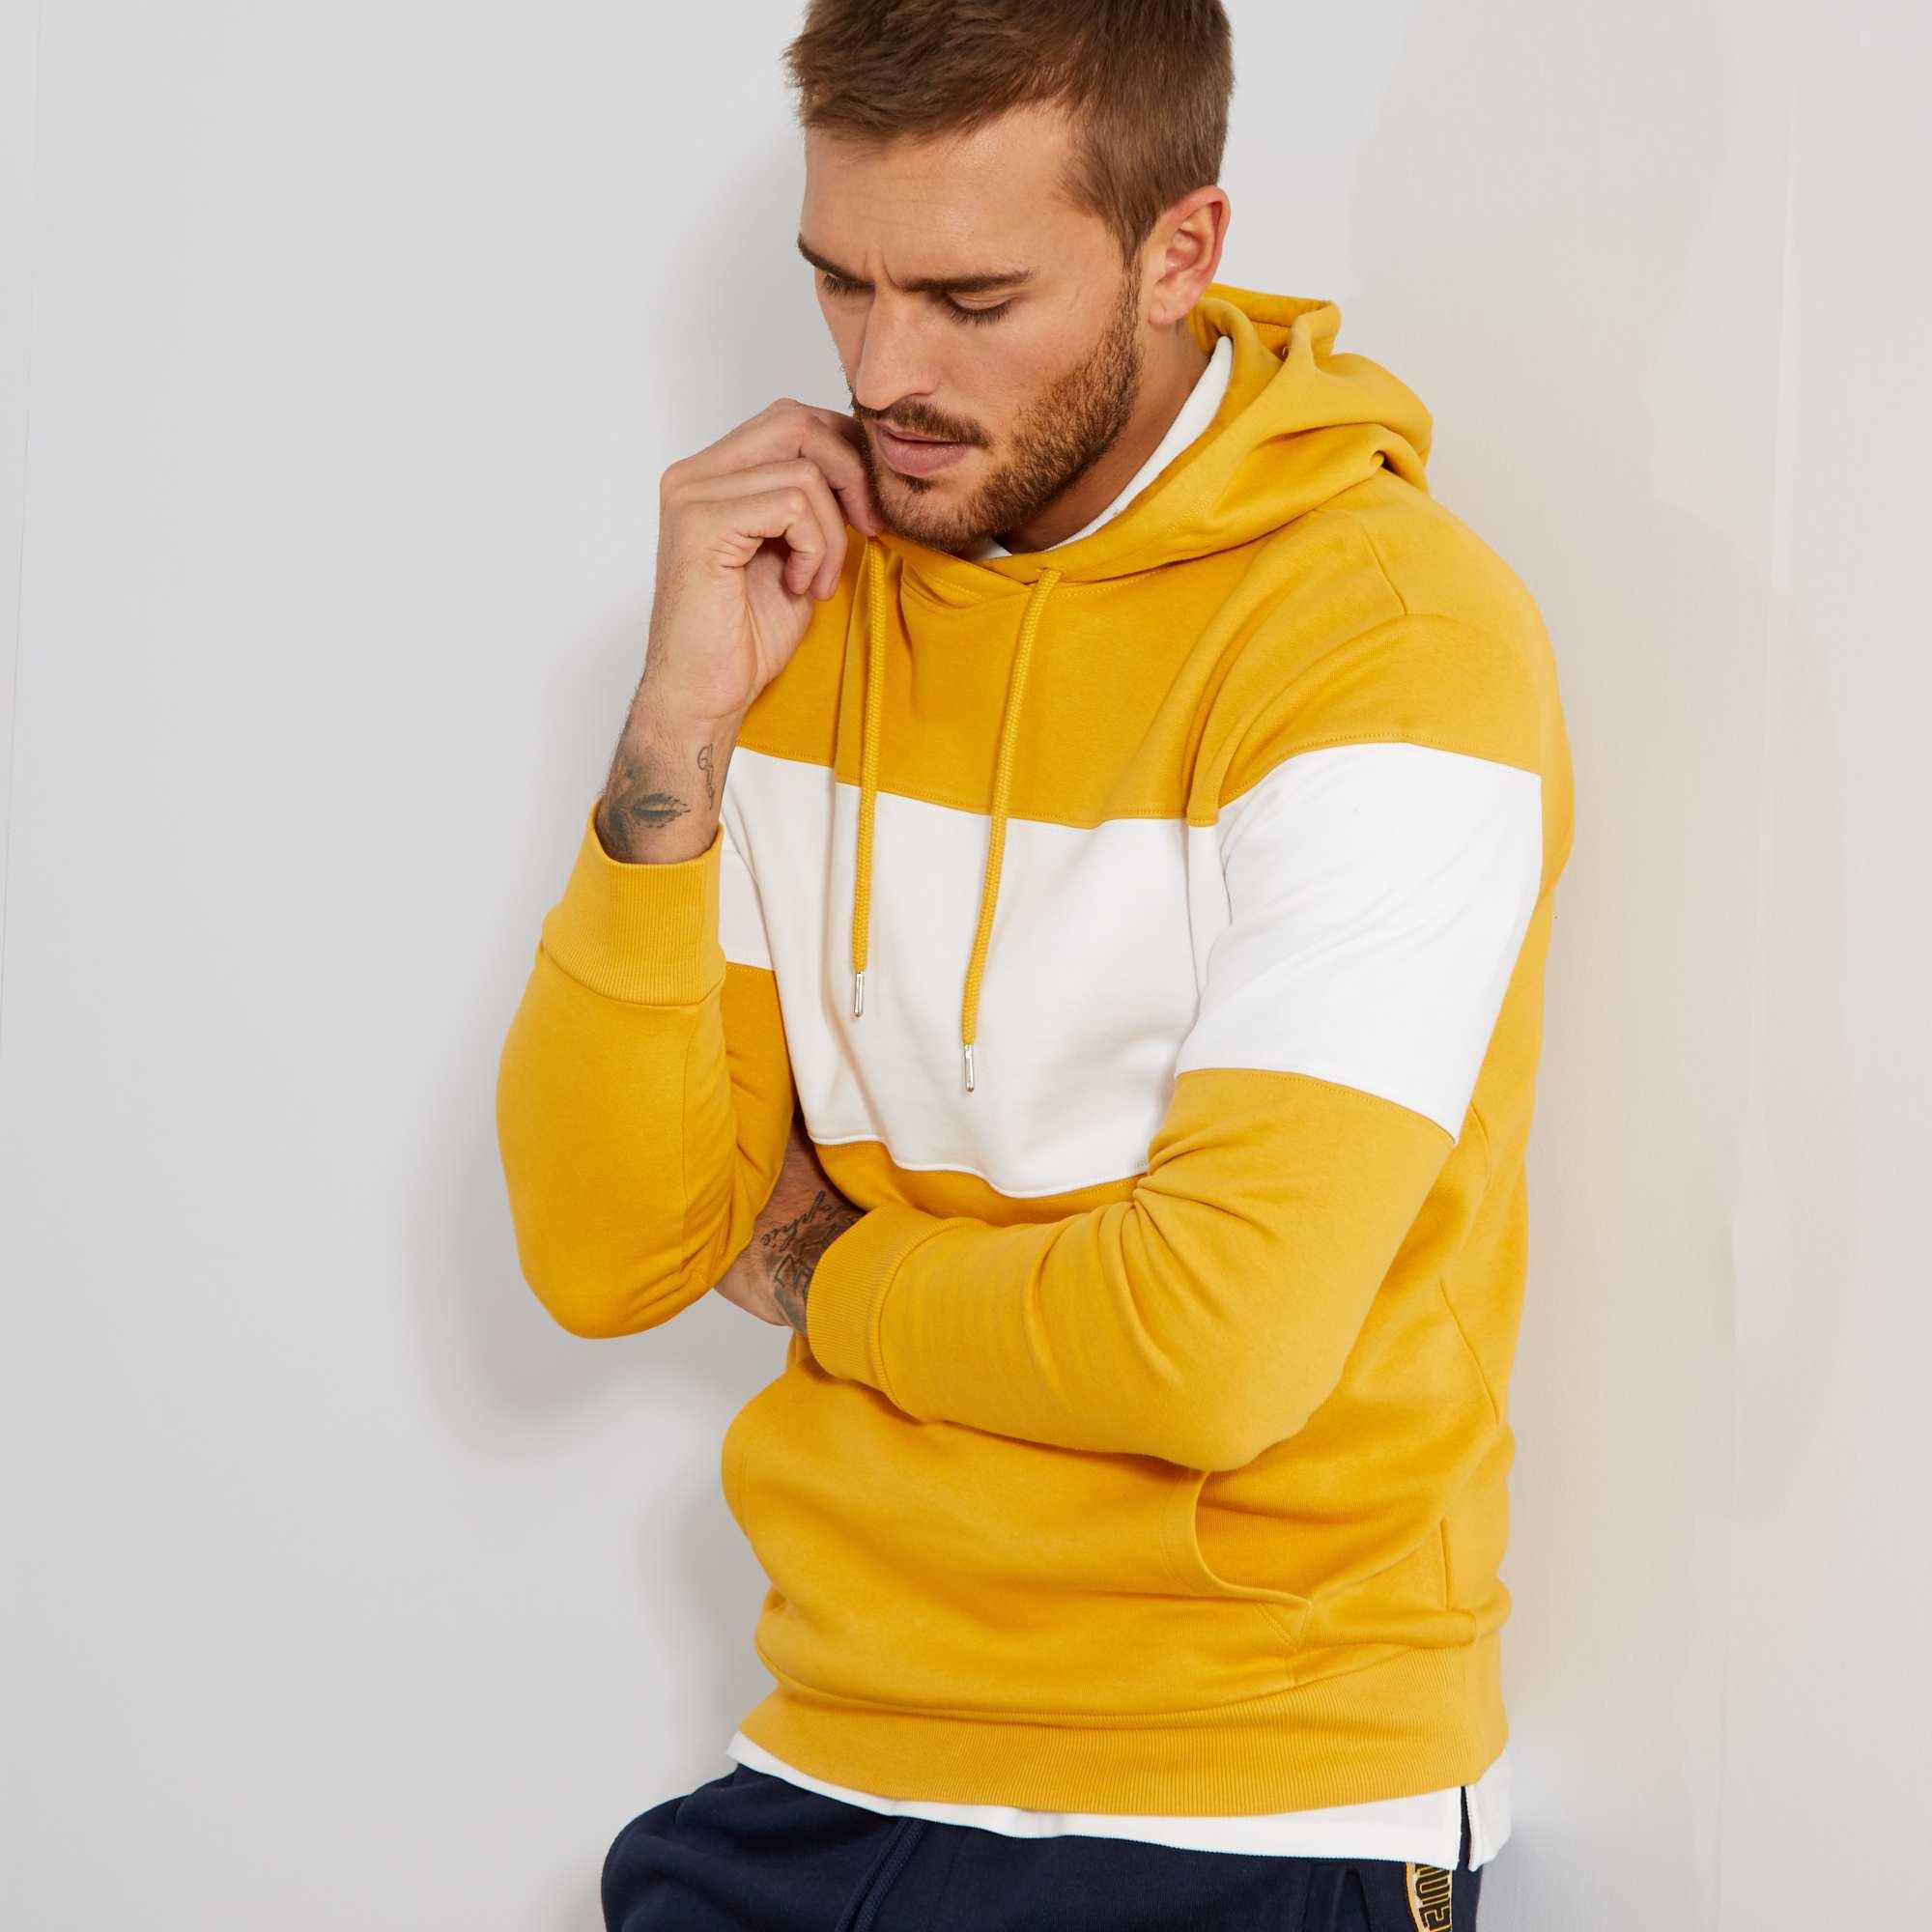 sweat capuche homme jaune blanc kiabi 15 00. Black Bedroom Furniture Sets. Home Design Ideas